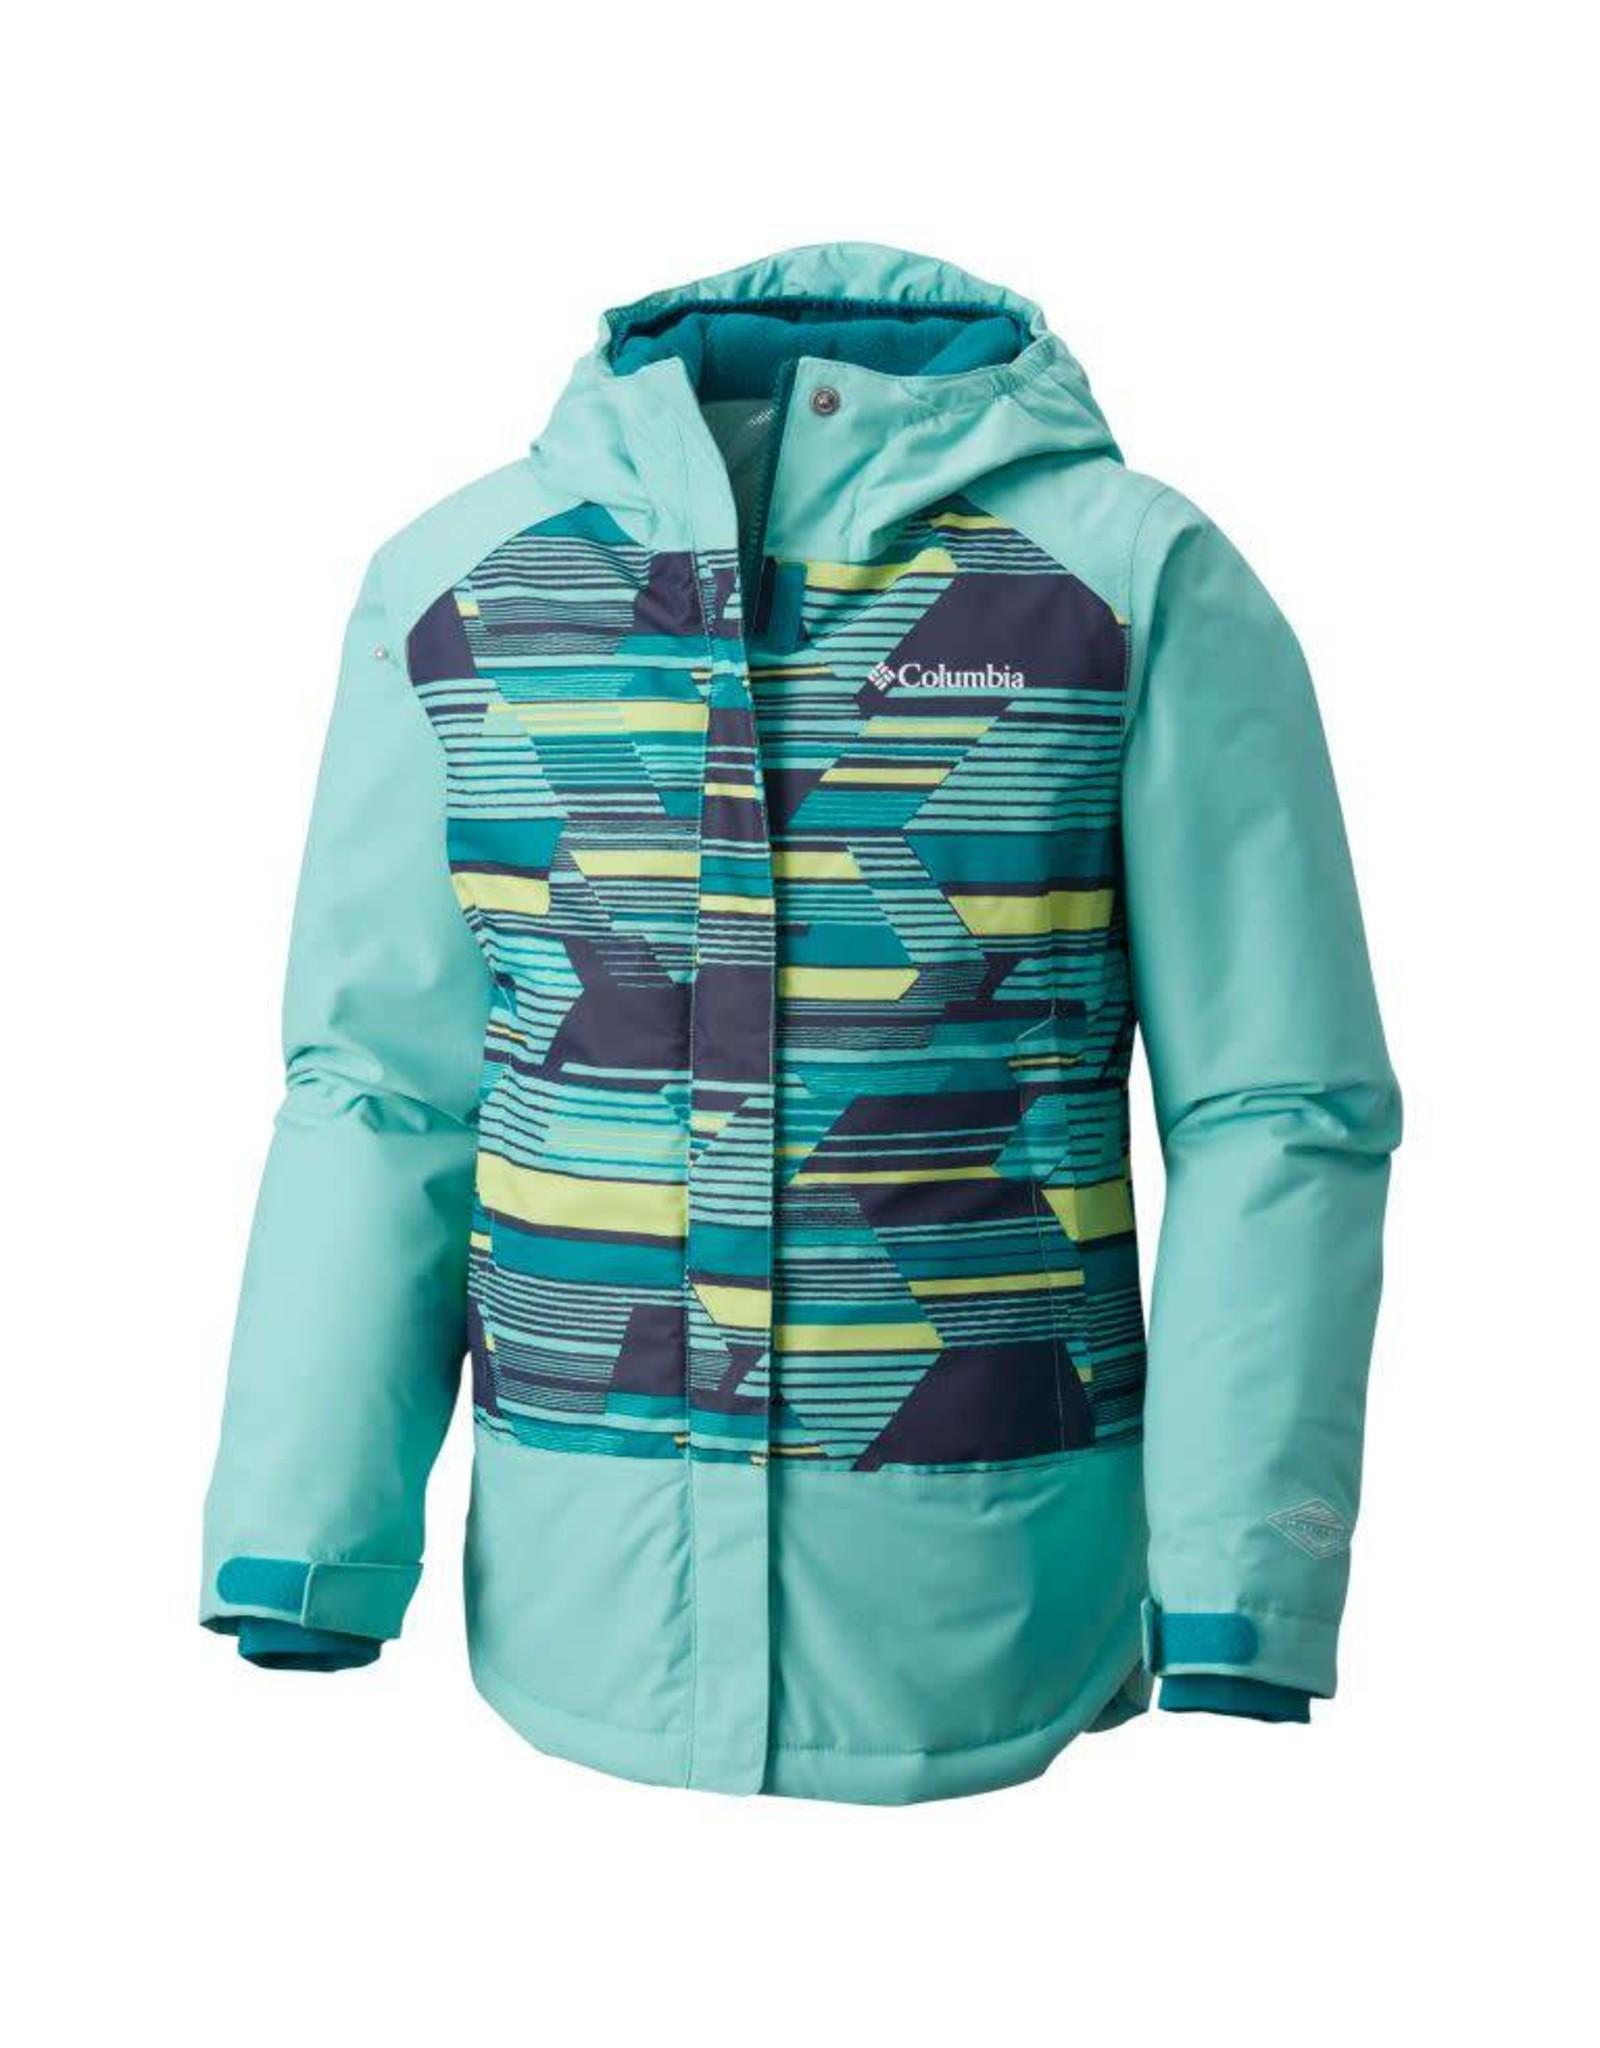 Columbia Sportswear Columbia Mighty Mogul Jacket